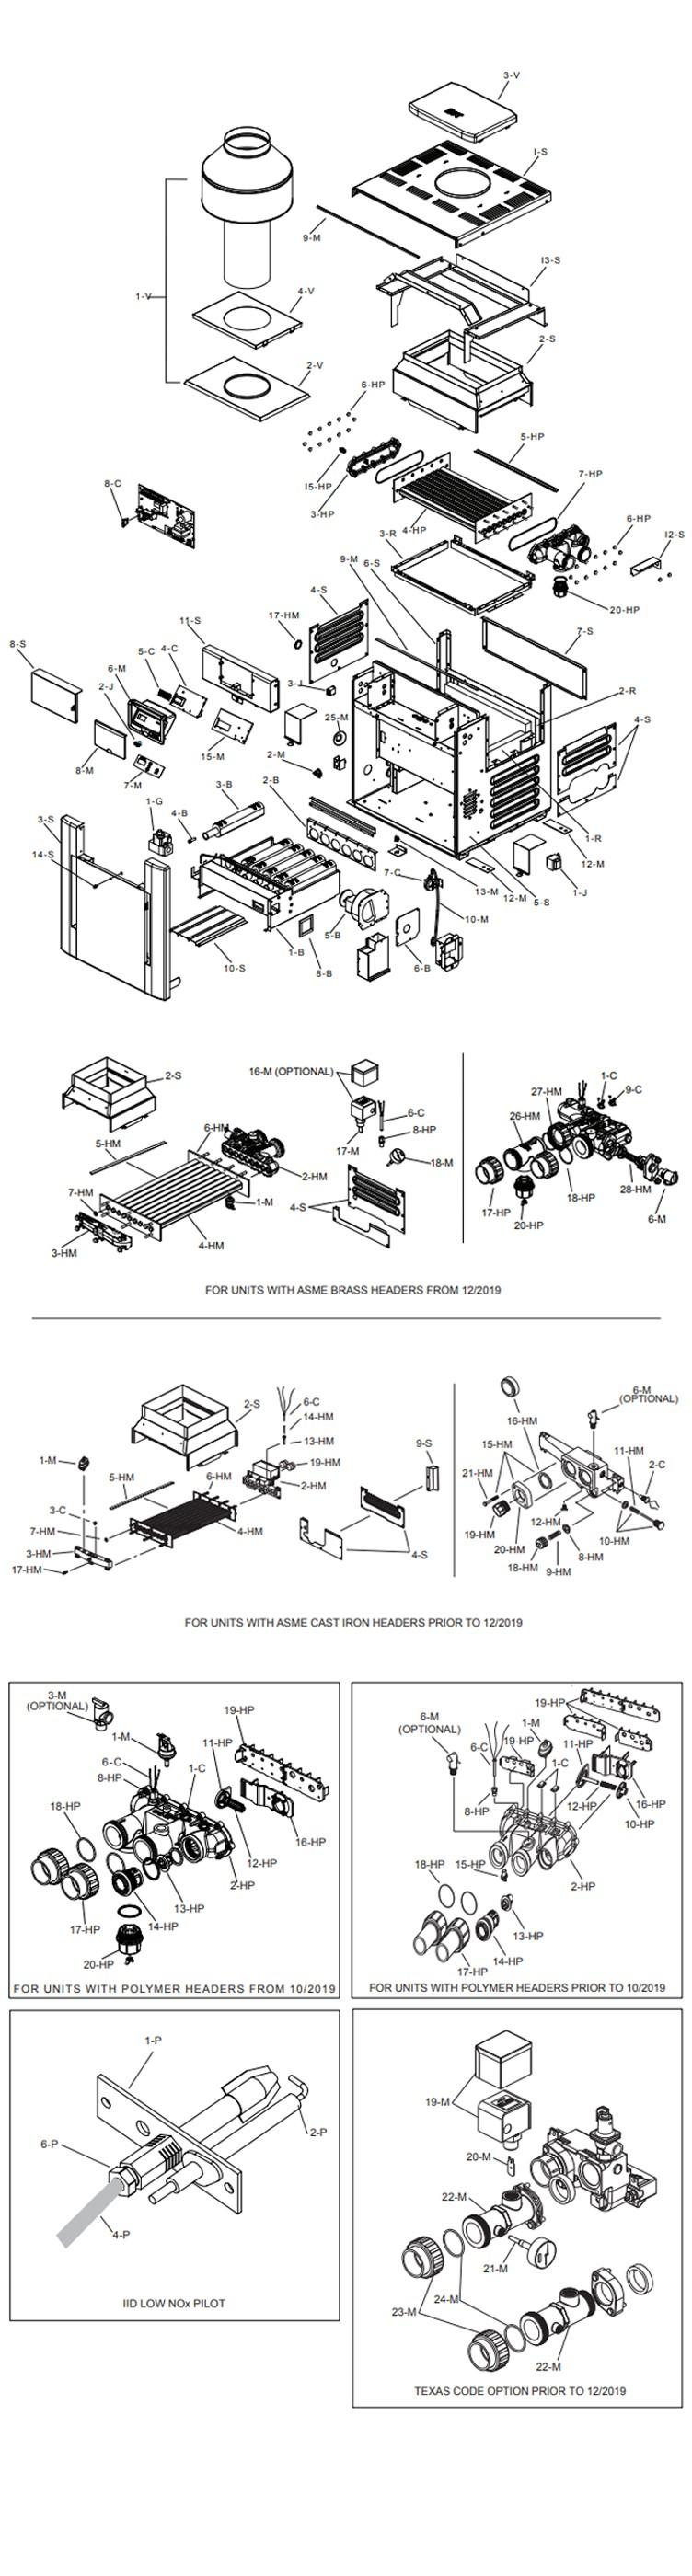 Raypak Digital Low NOx ASME Natural Gas Commercial Swimming Pool Heater | 399k BTU Cupro Nickel Heat Exchanger | Altitude 0-5000 Ft | C-R407A-EN-X 010230 | B-R407A-EN-X #26 017712 Parts Schematic